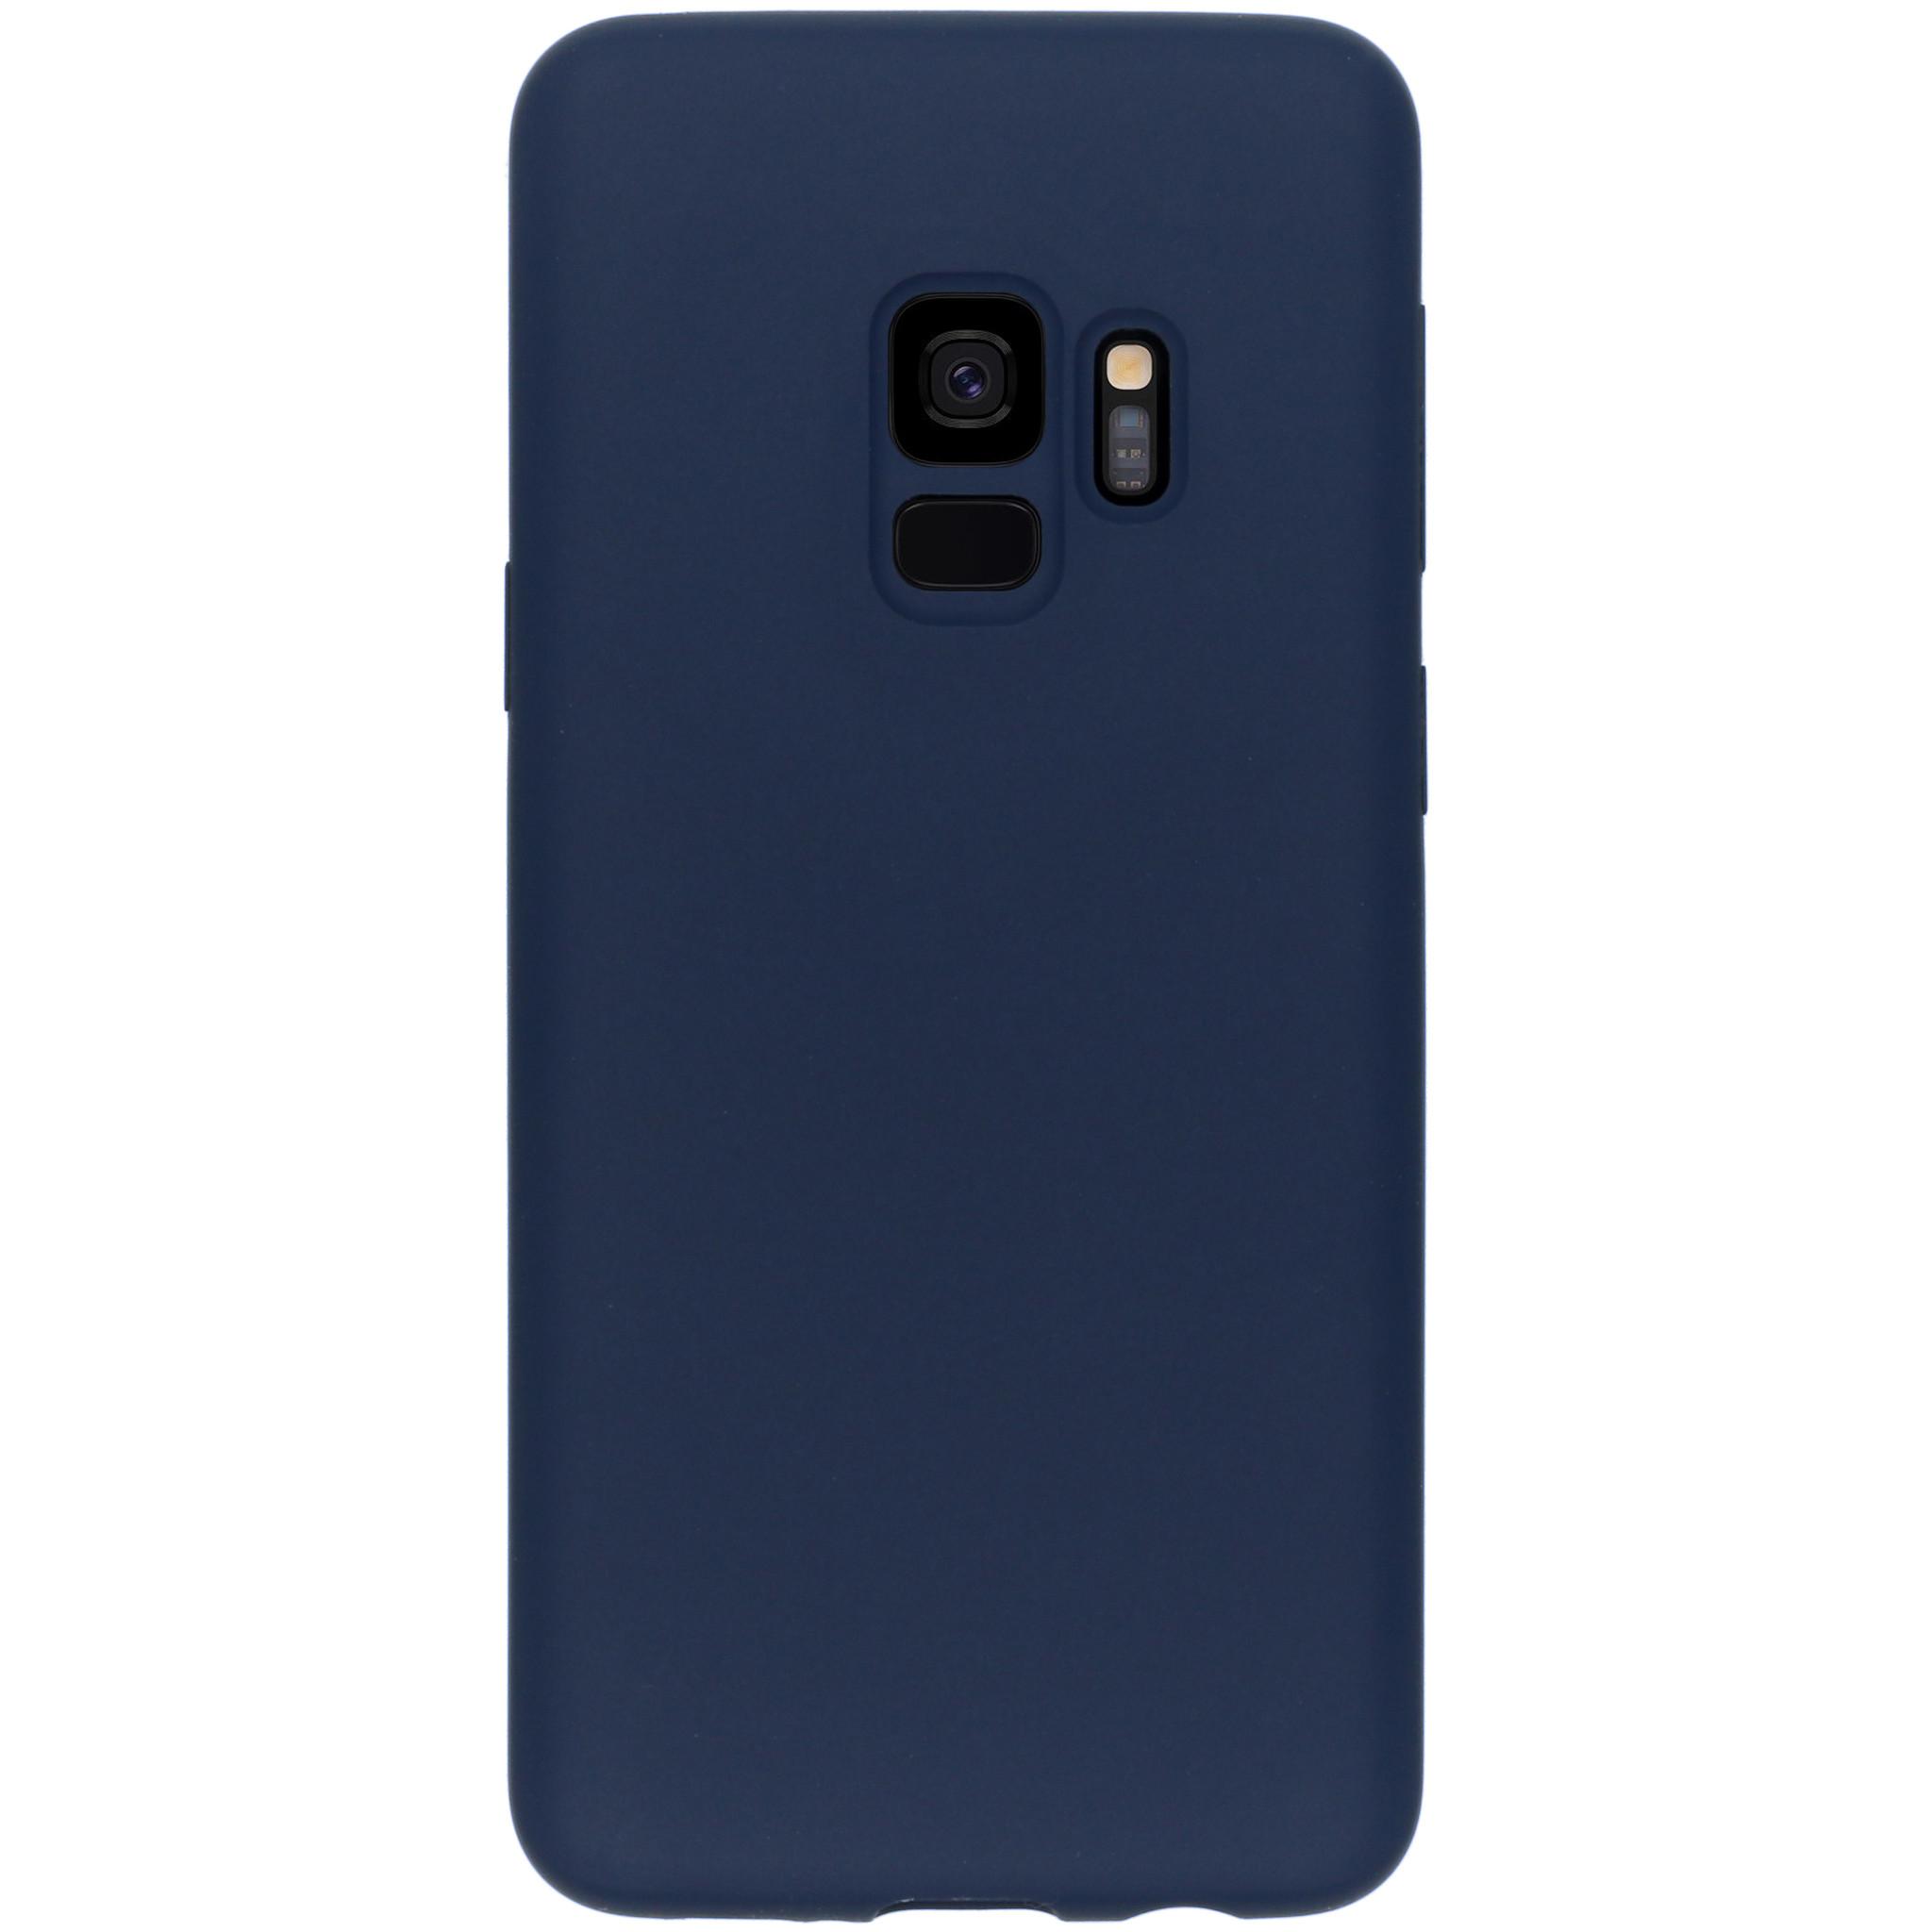 Accezz Liquid Silikoncase Blau für das Samsung Galaxy S9